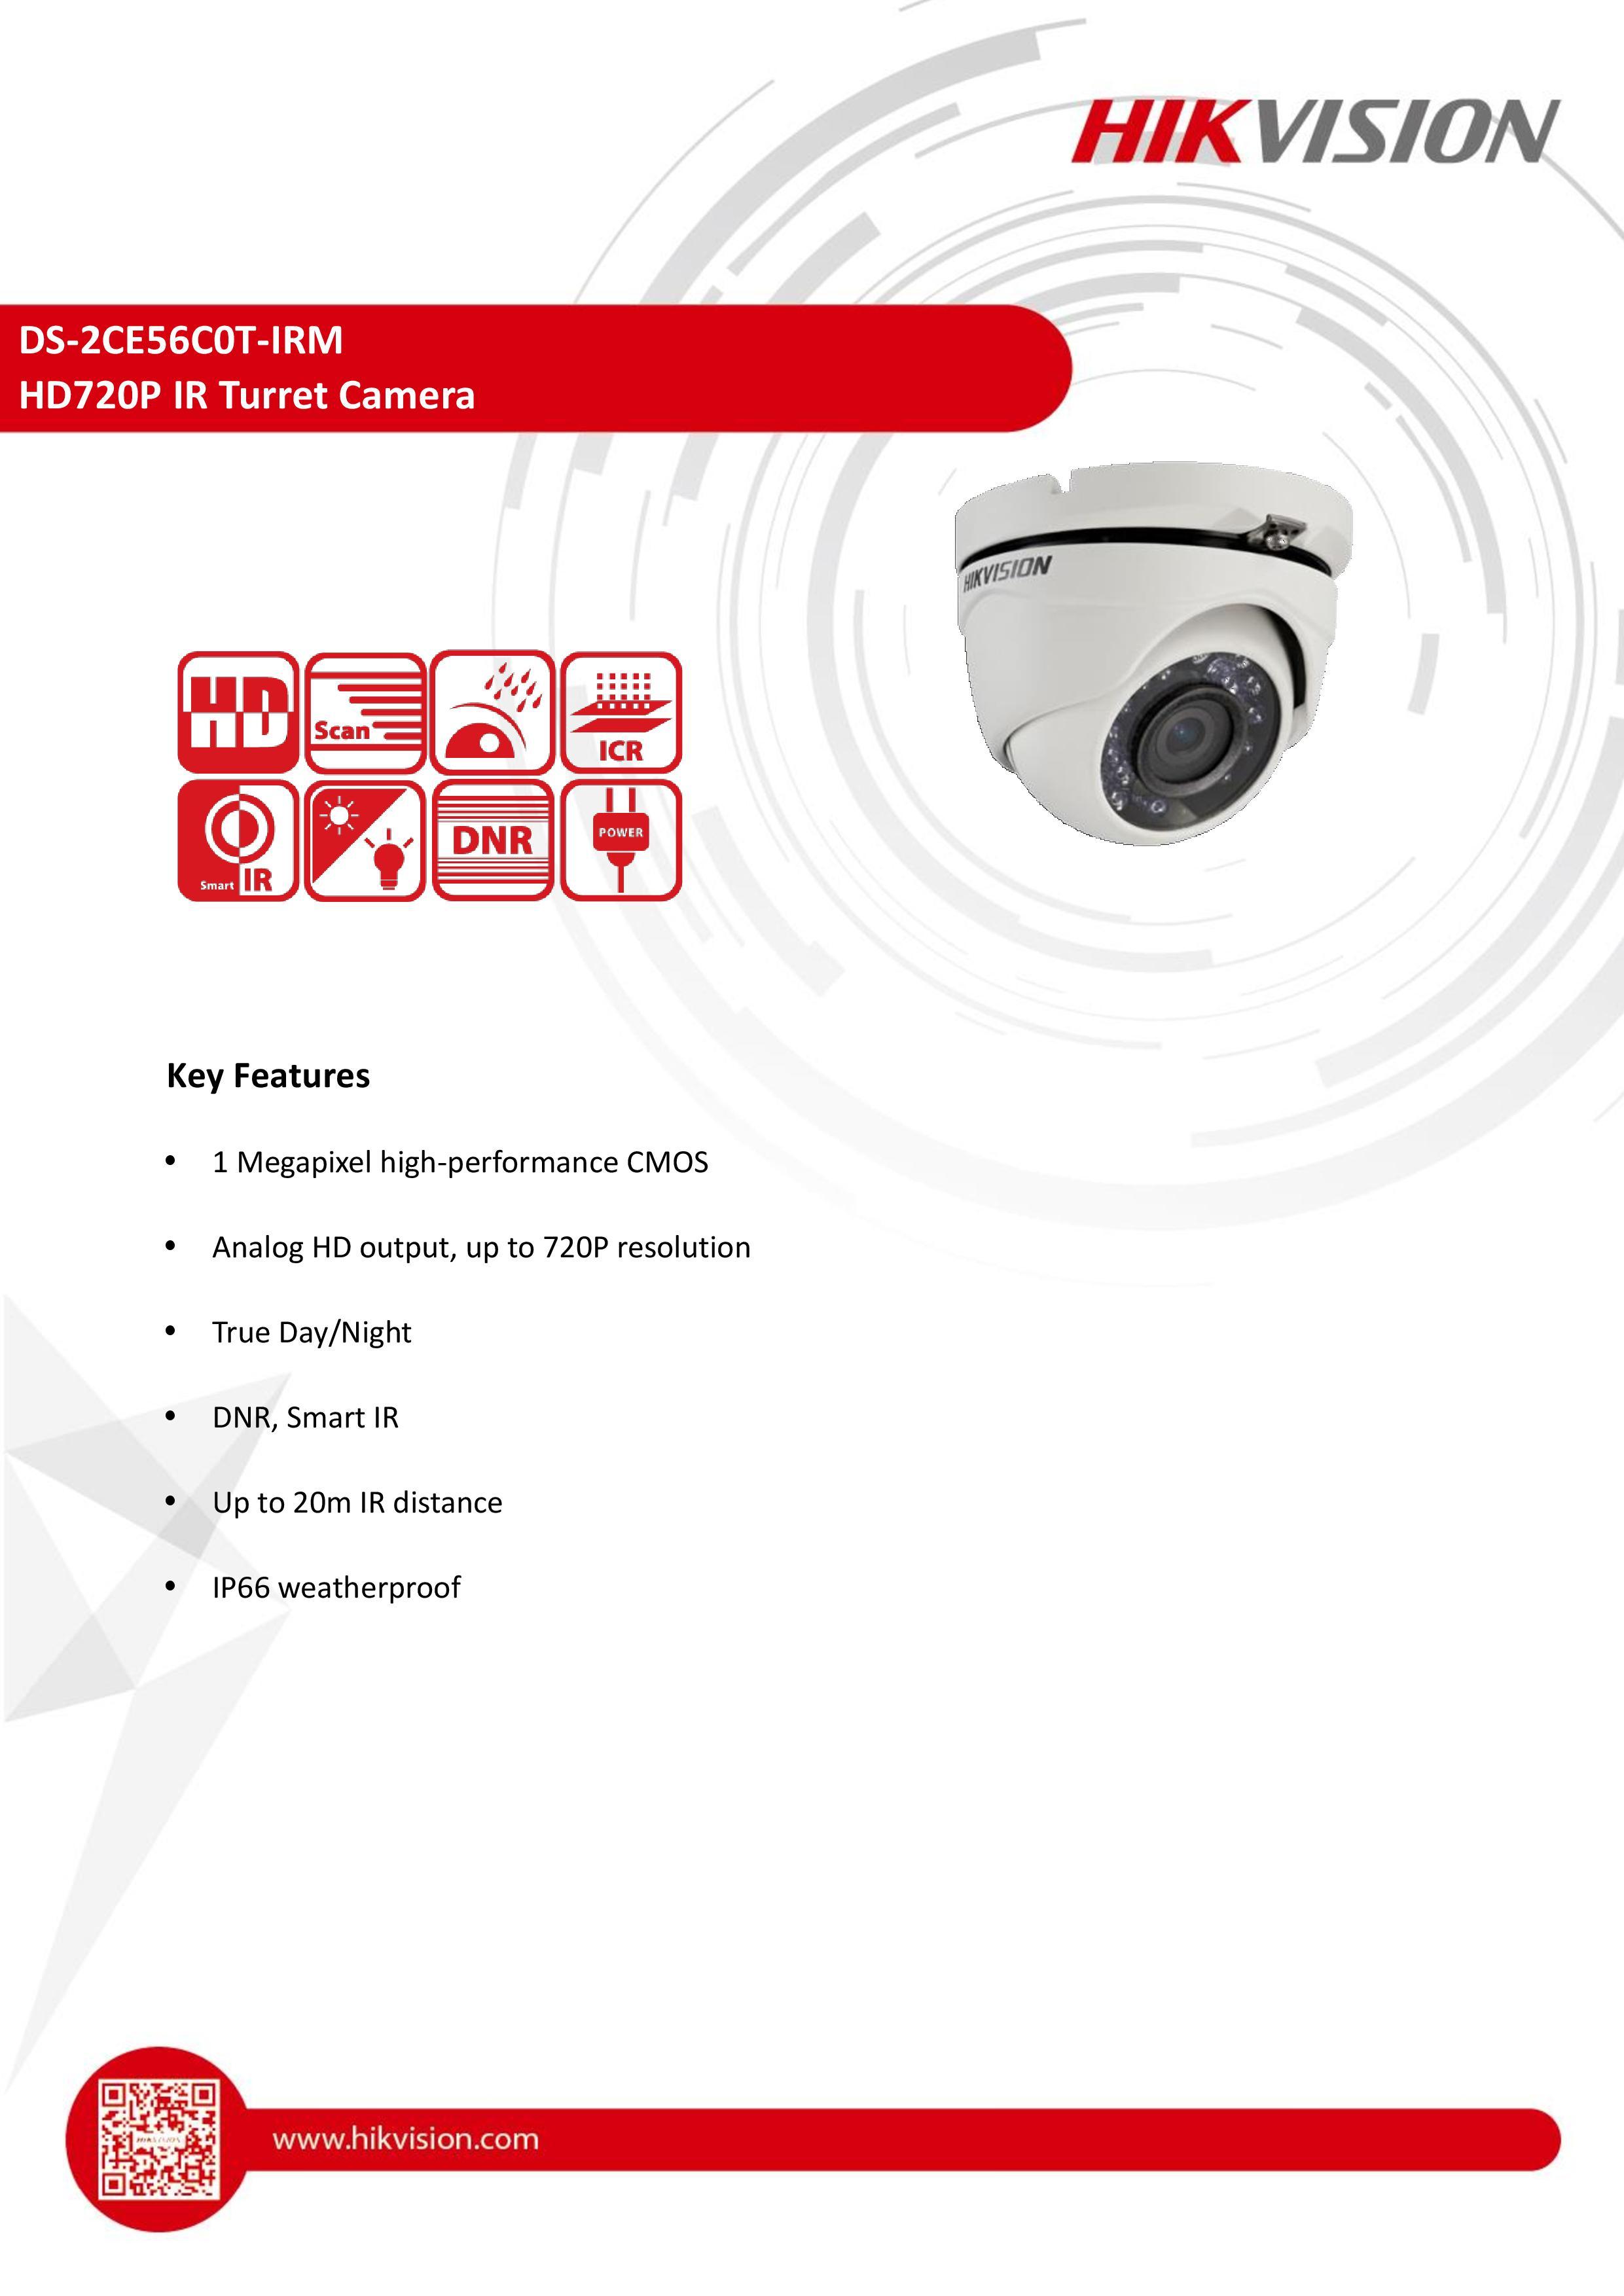 DS-2CE56C0T-IRMHD720P IR Turret Camera 2.8m.,3mm.,6mm